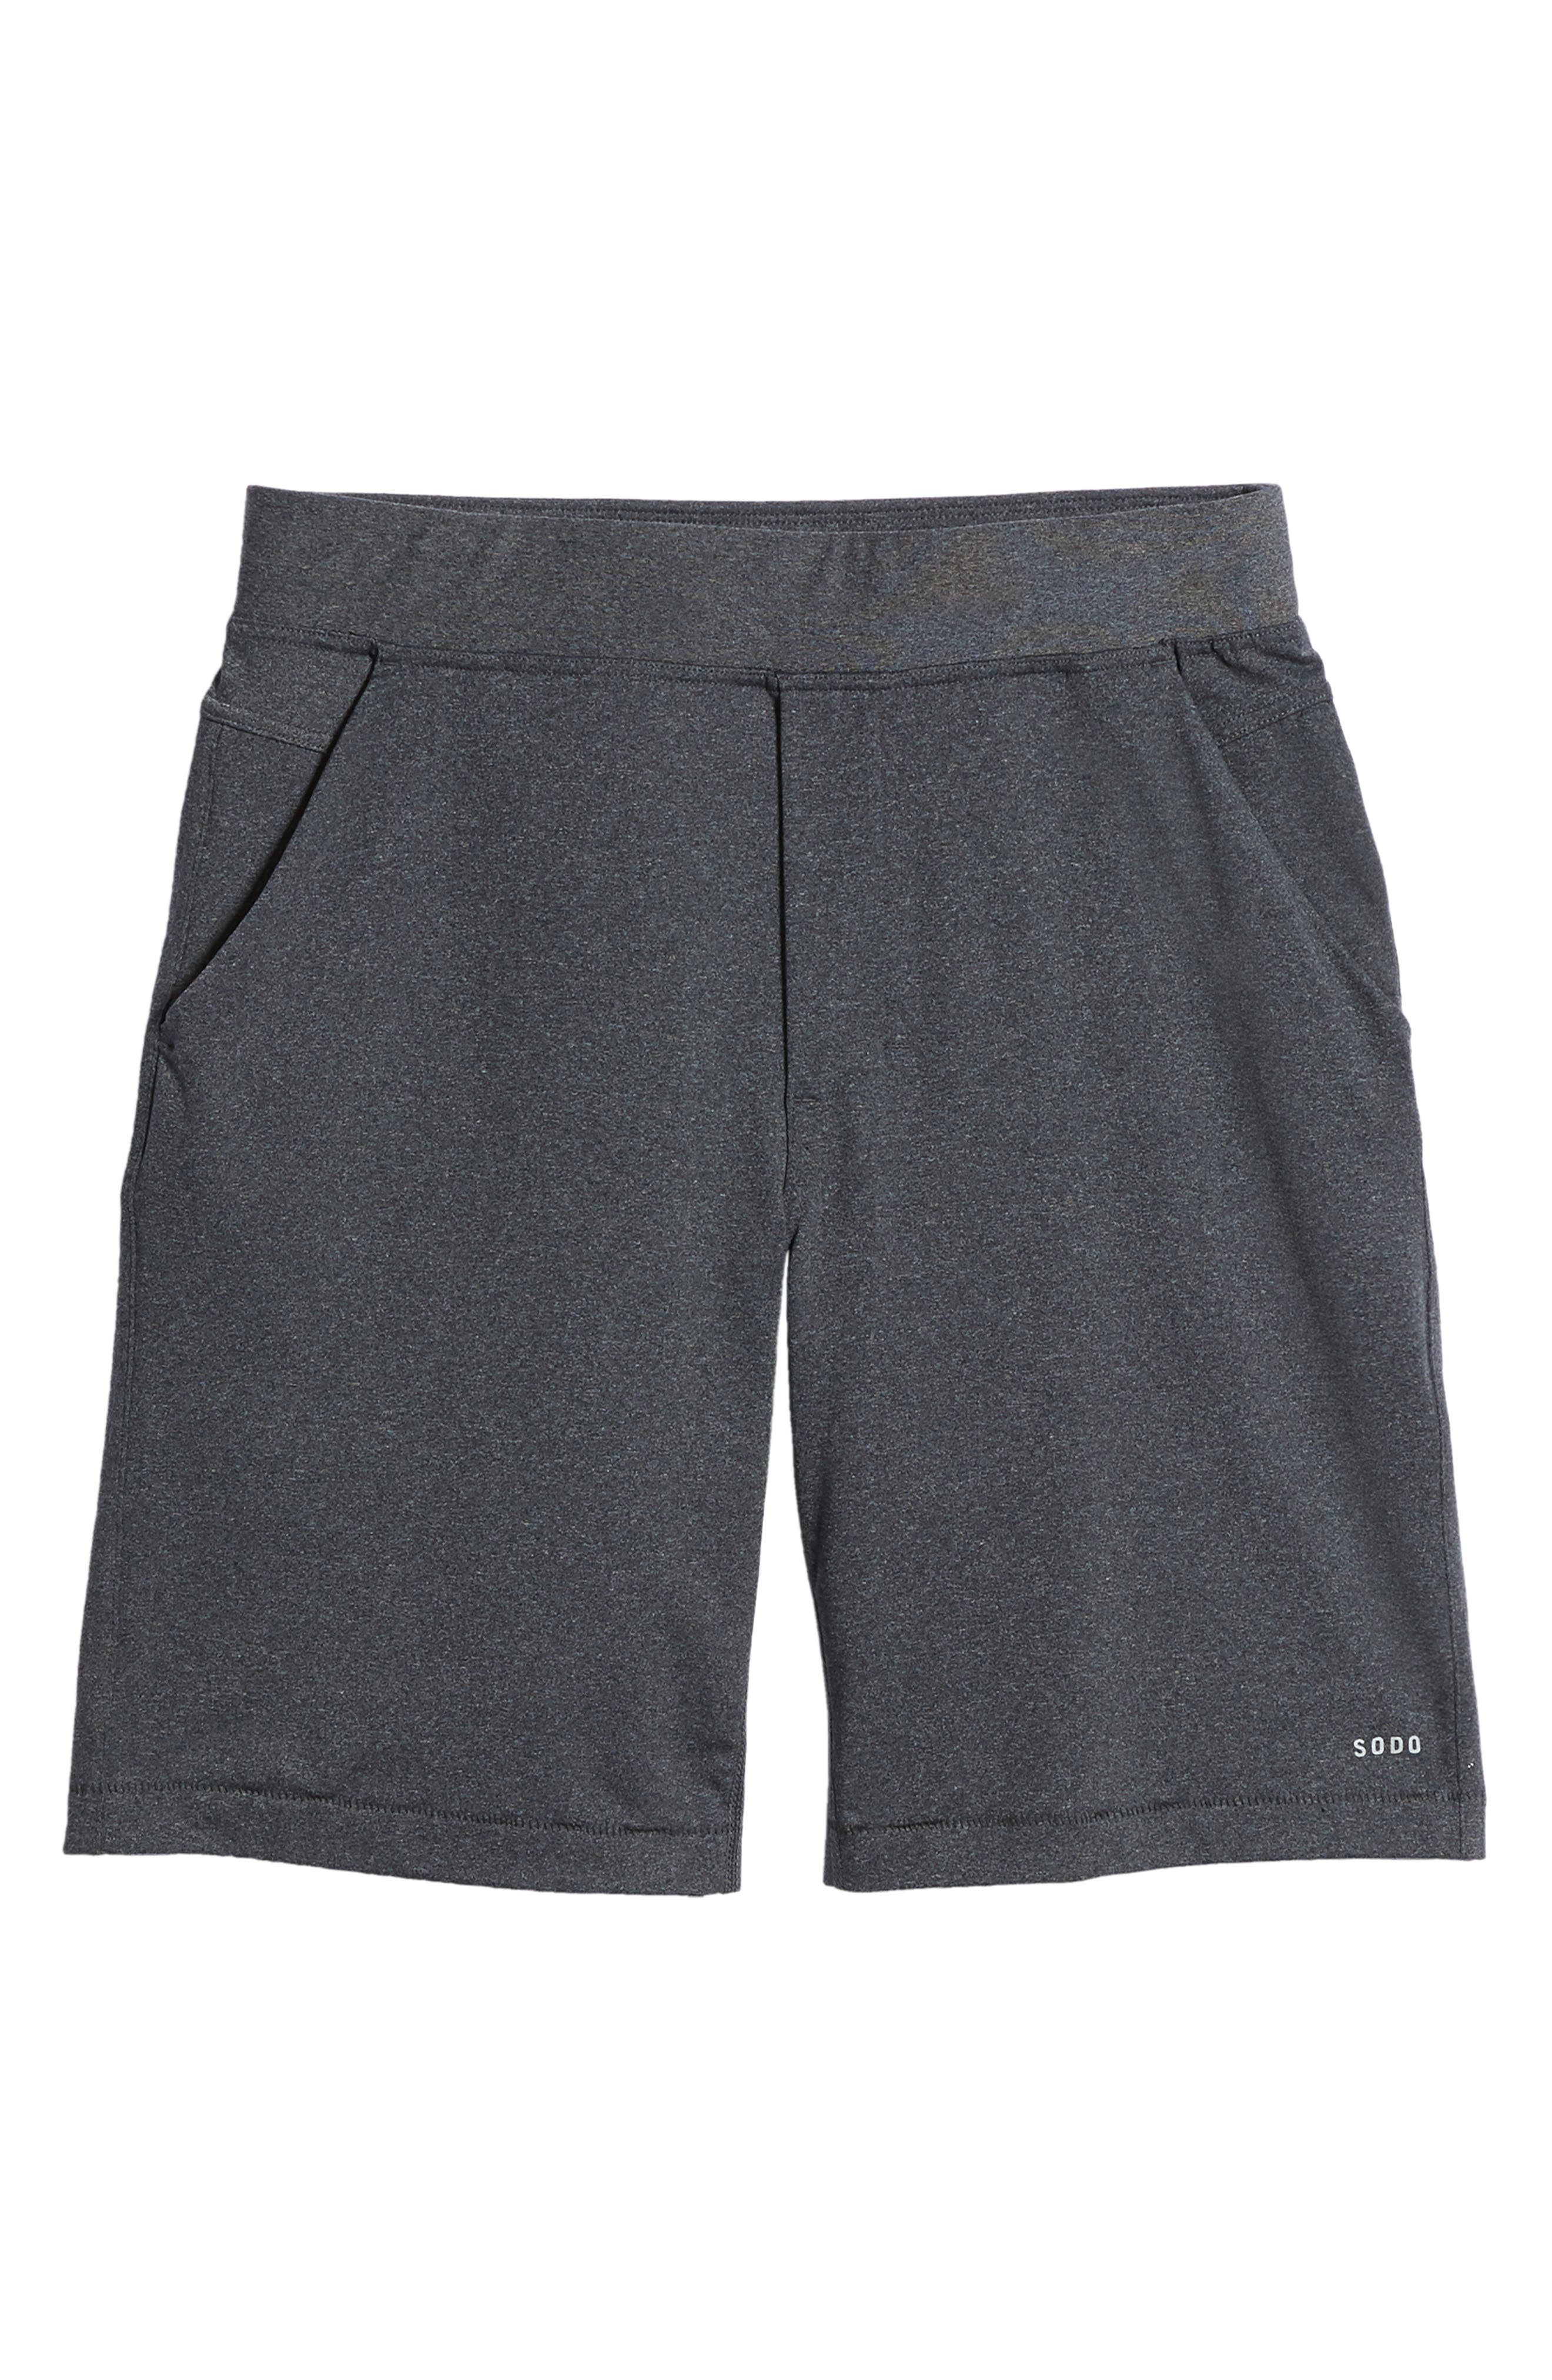 206 Shorts,                             Alternate thumbnail 6, color,                             Charcoal